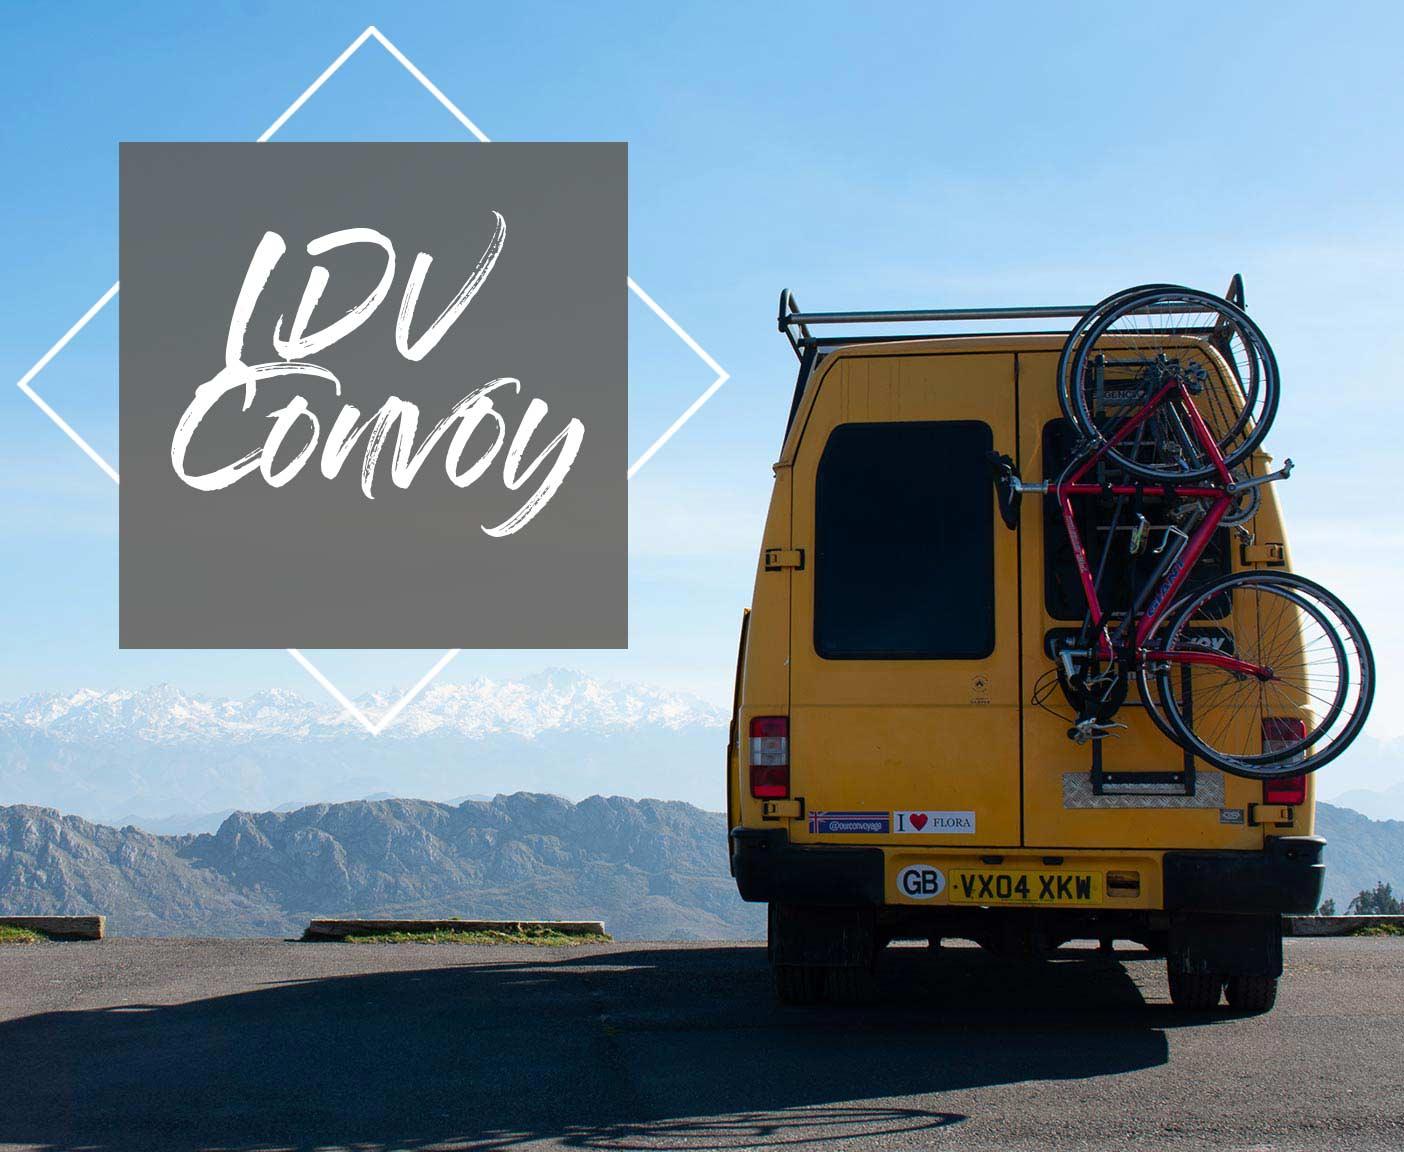 ldv-convoy-buy-maxus-camper-van